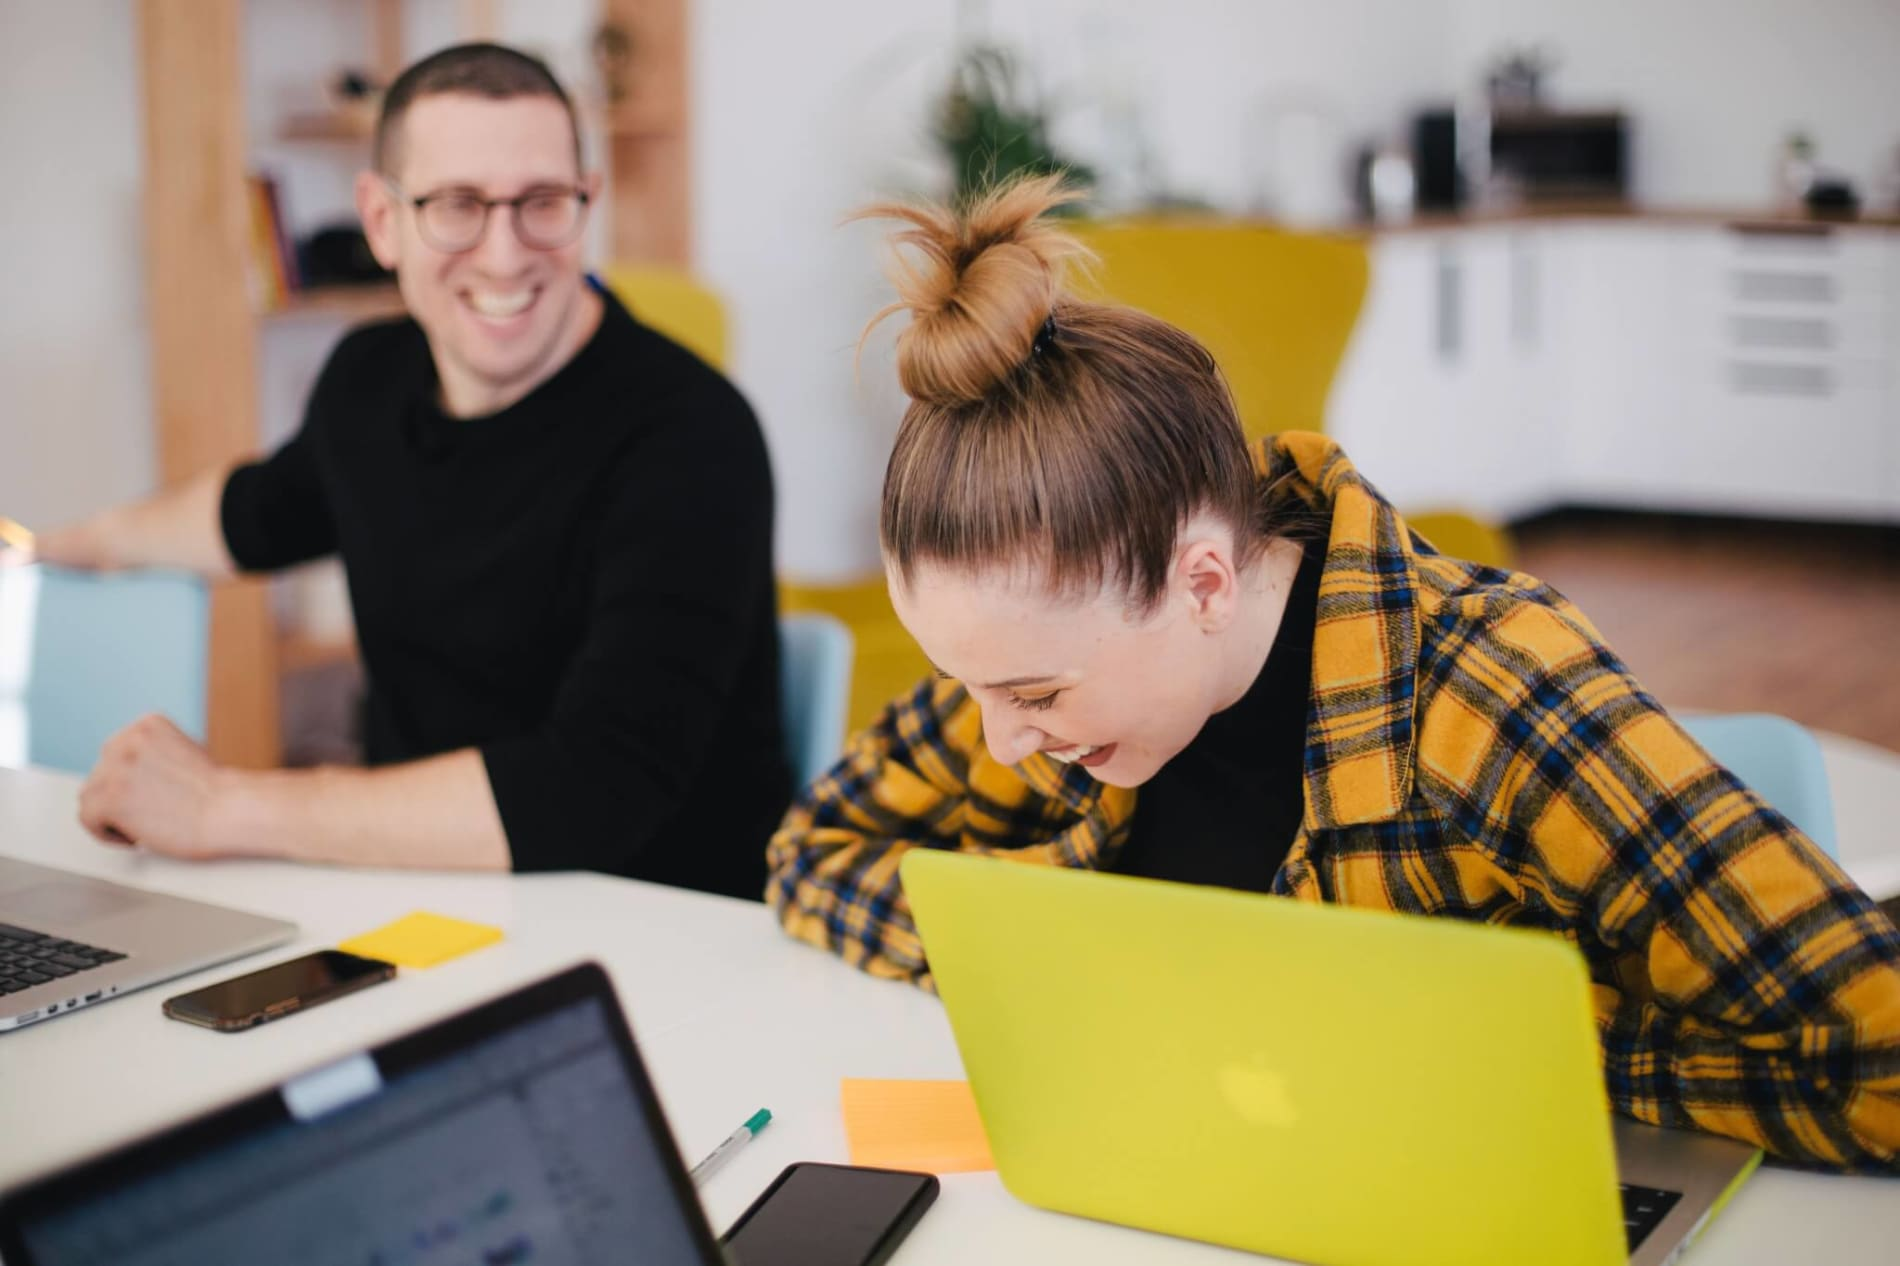 HR people leaders of the month: Sander Bais and Khatidja Tjon-Atsoi at NewMotion - you-x-ventures-0K7GgiA8lVE-unsplash.jpg